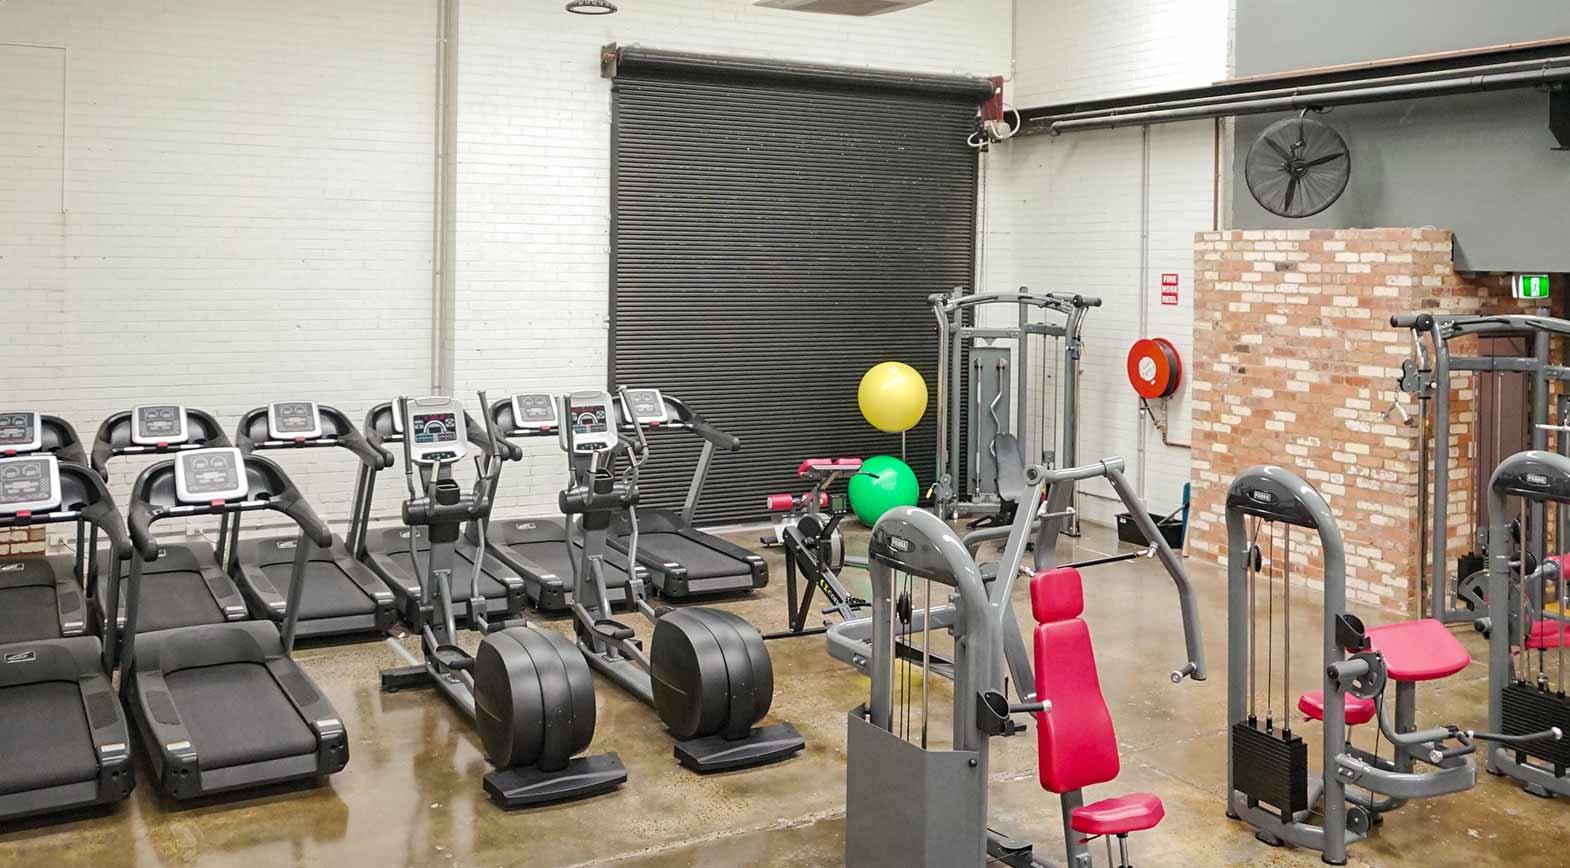 dukes gym richmond cardio machines